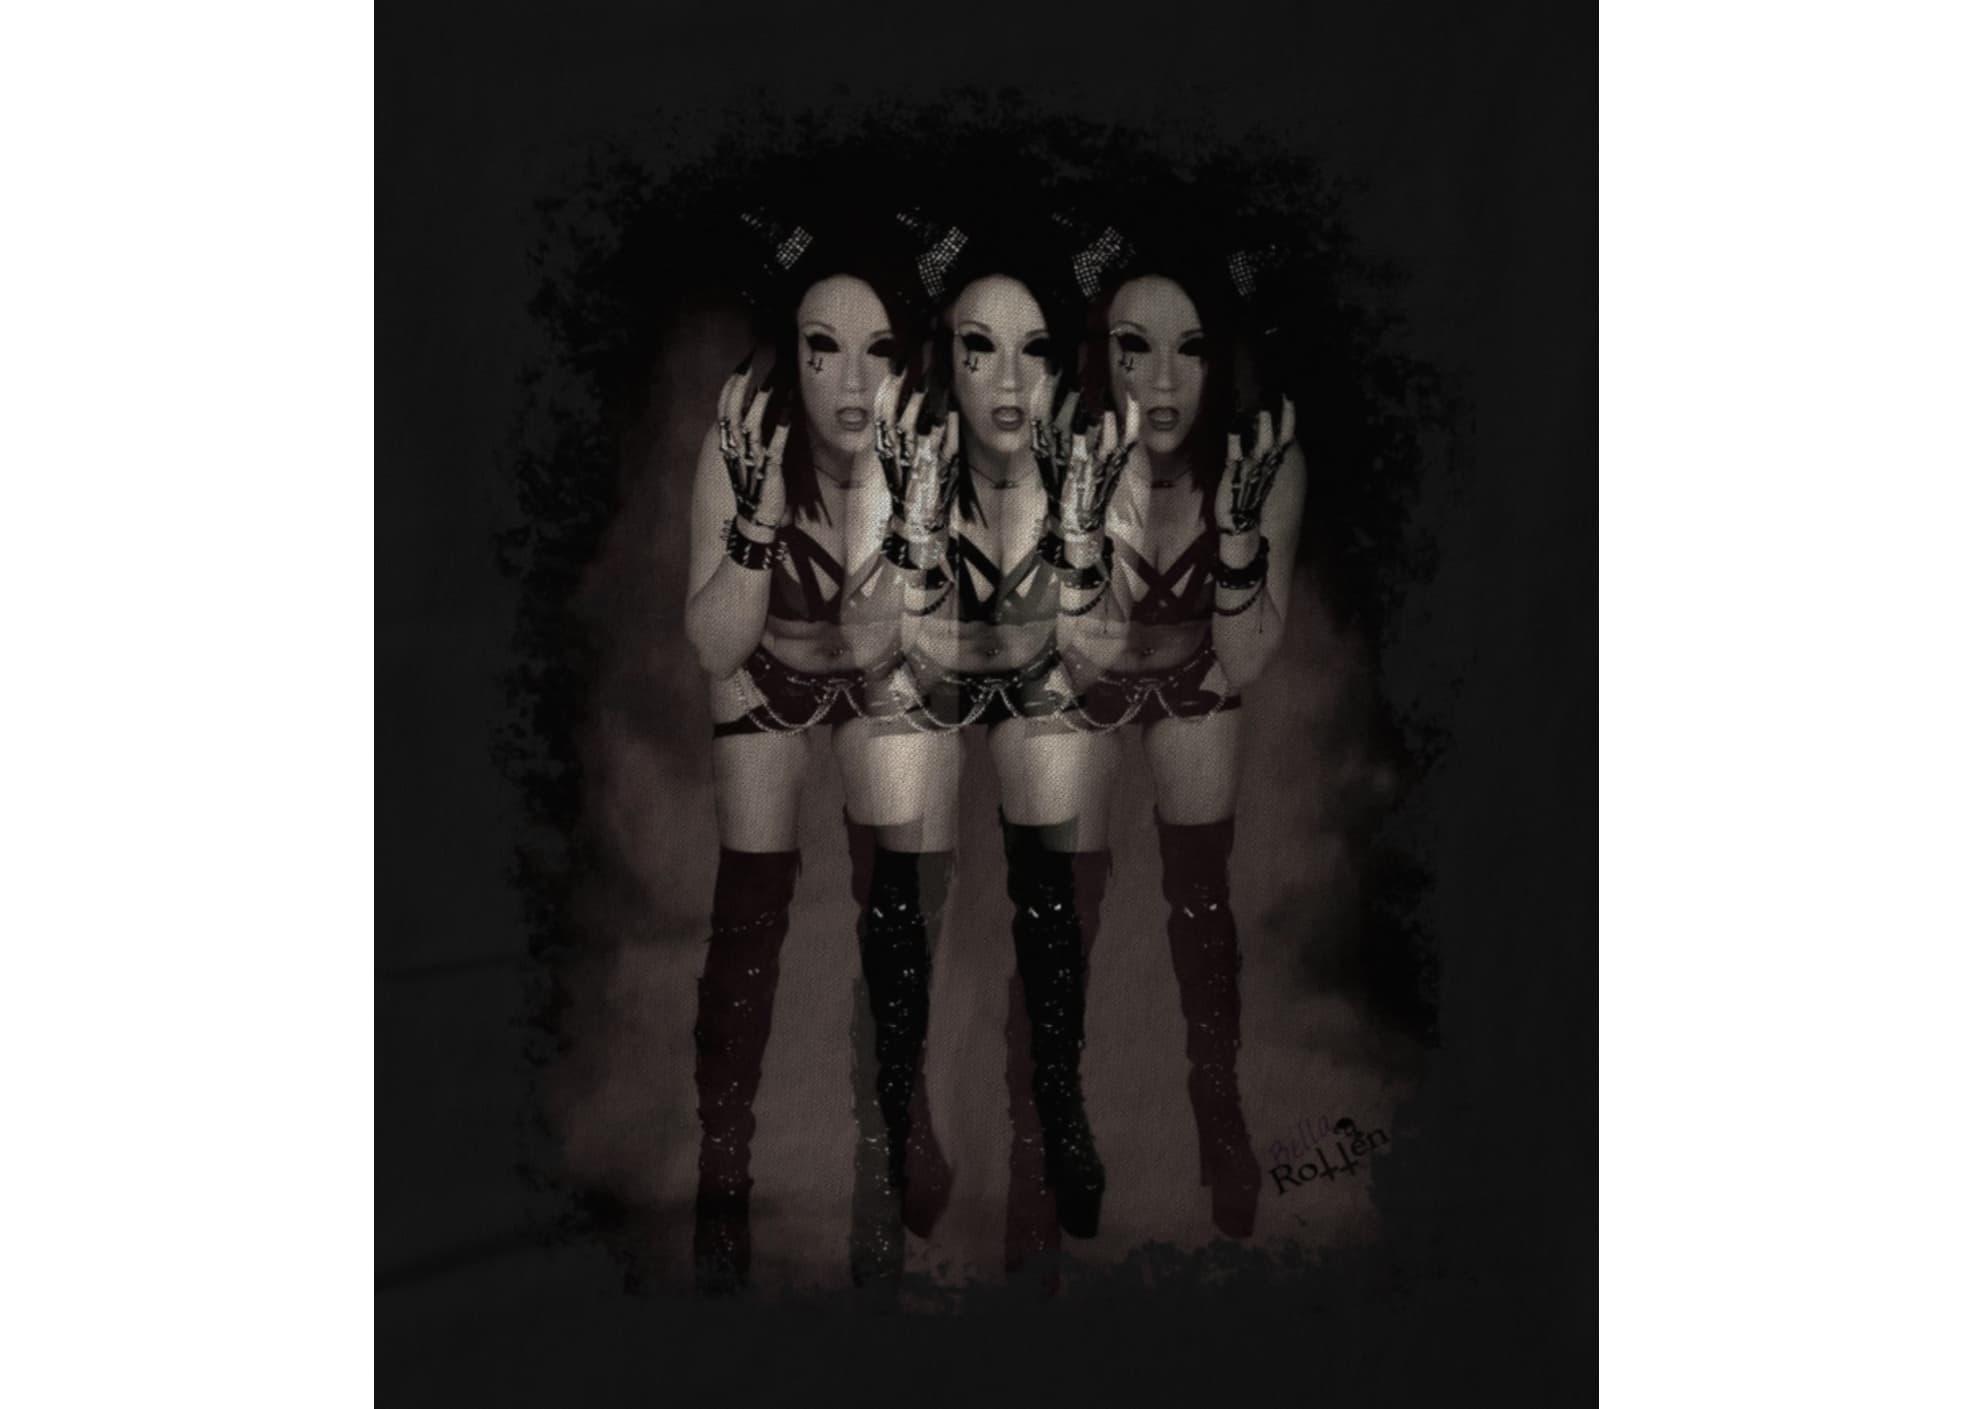 Bella rotten mirrored 1598281762